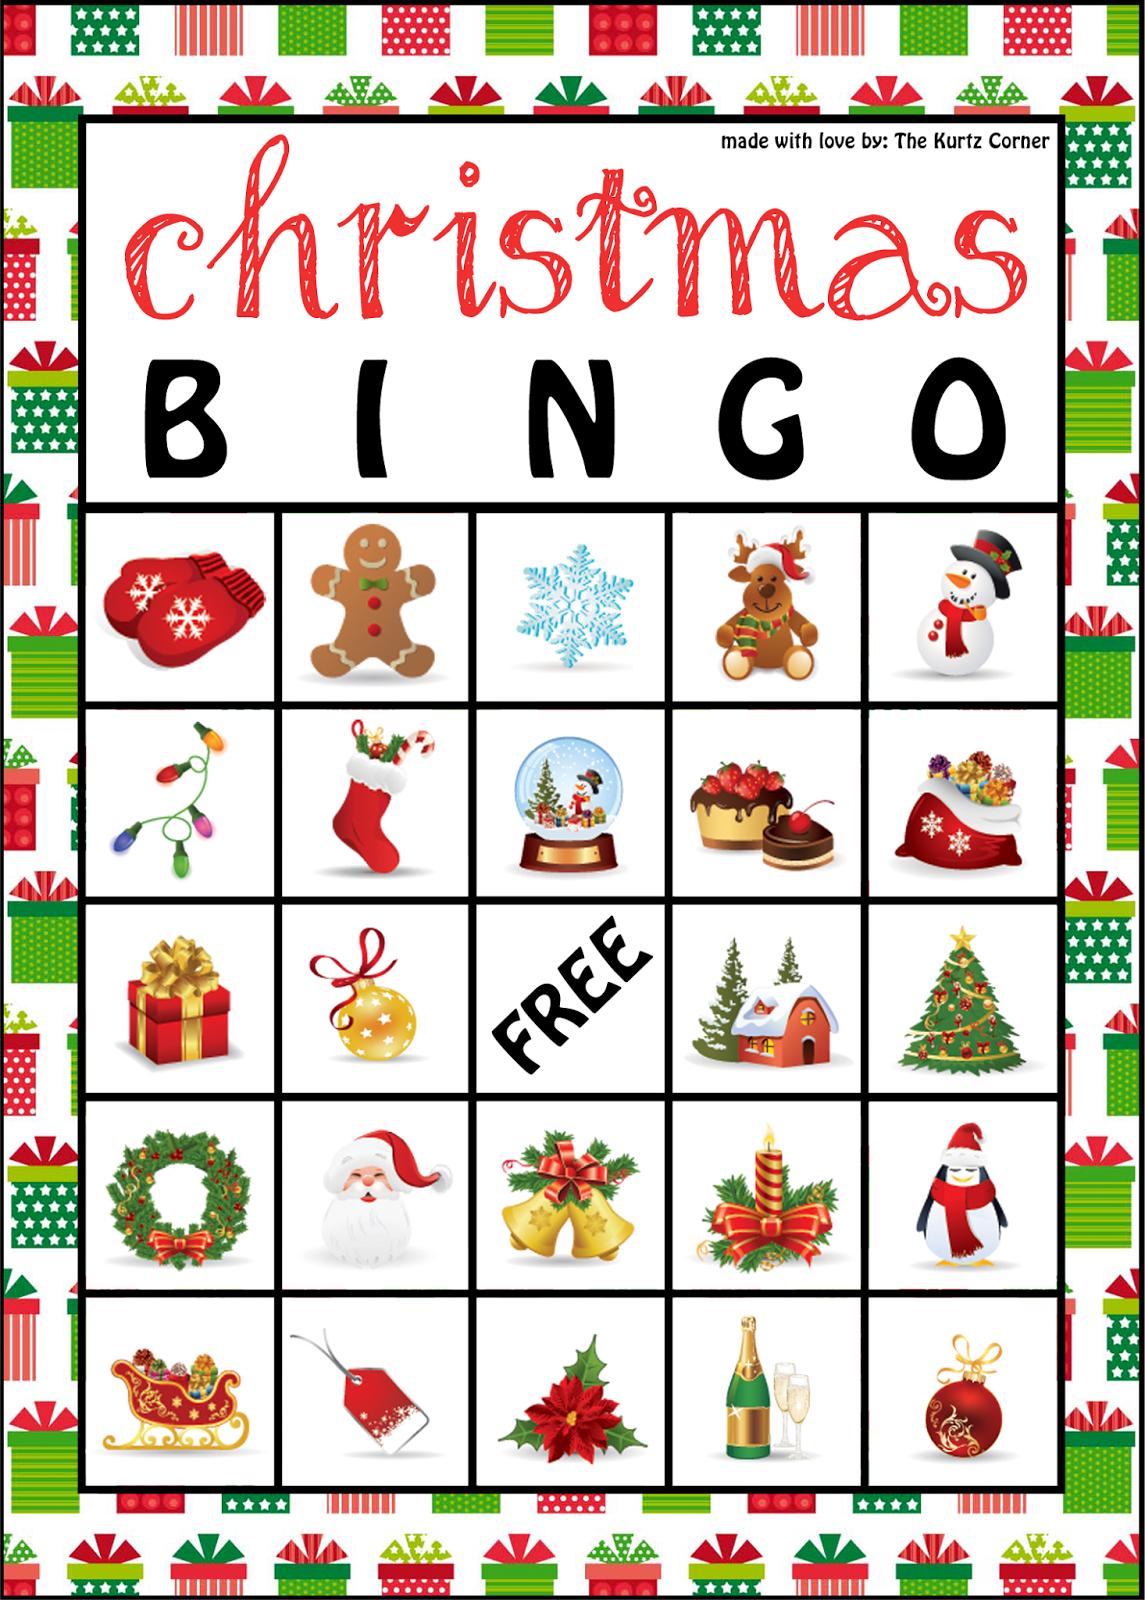 The Kurtz Corner: Free Printable Christmas Bingo Cards | Winter / X - Free Printable Christmas Bingo